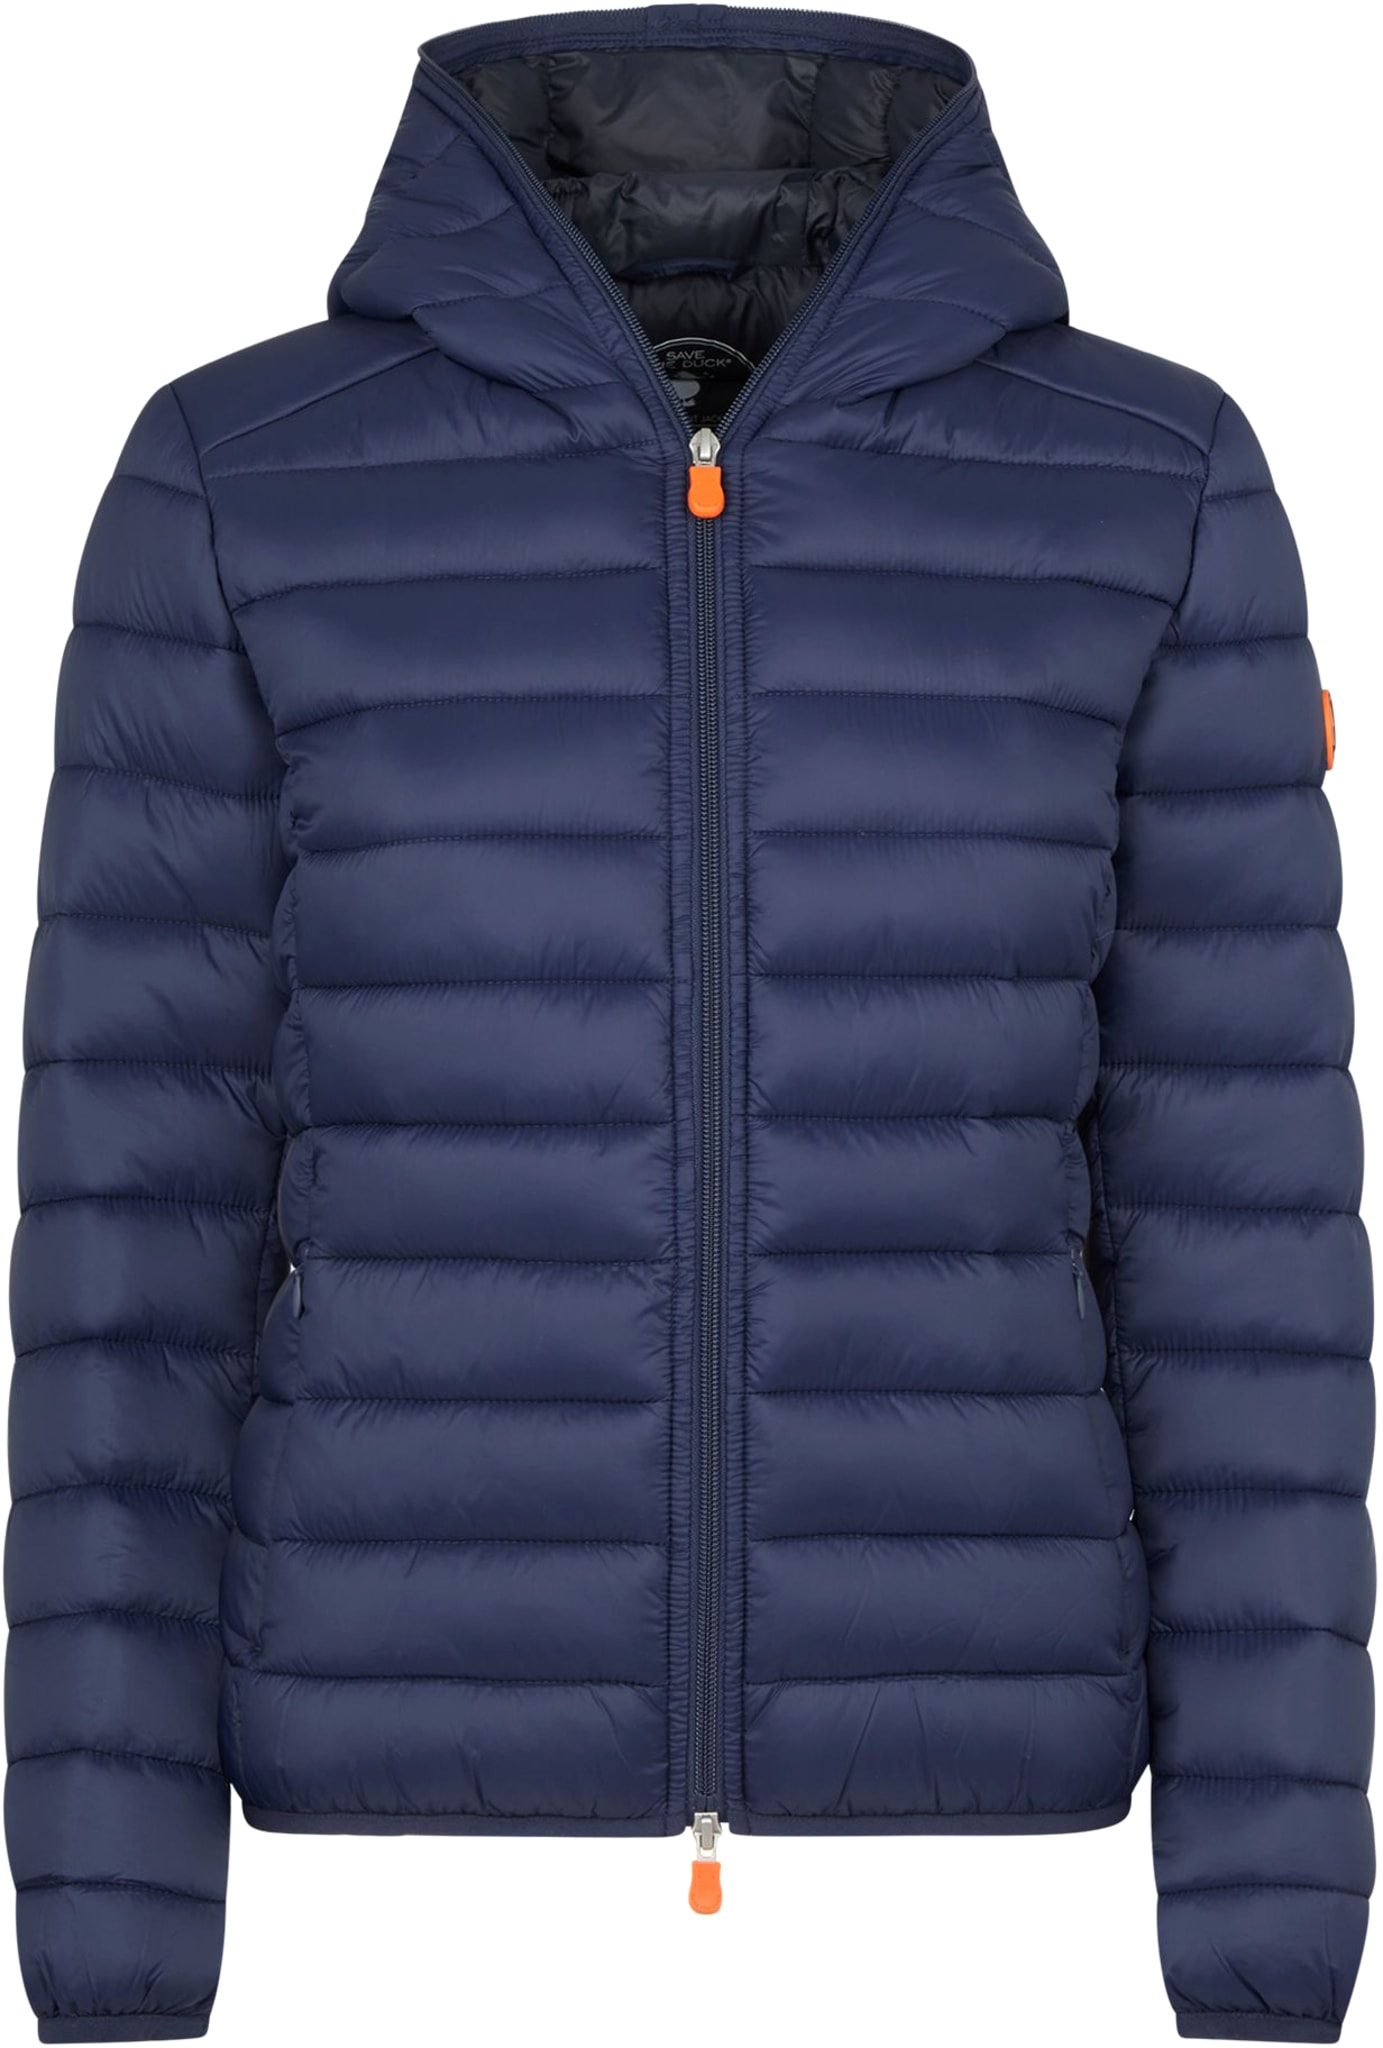 Giga Hooded Jacket W